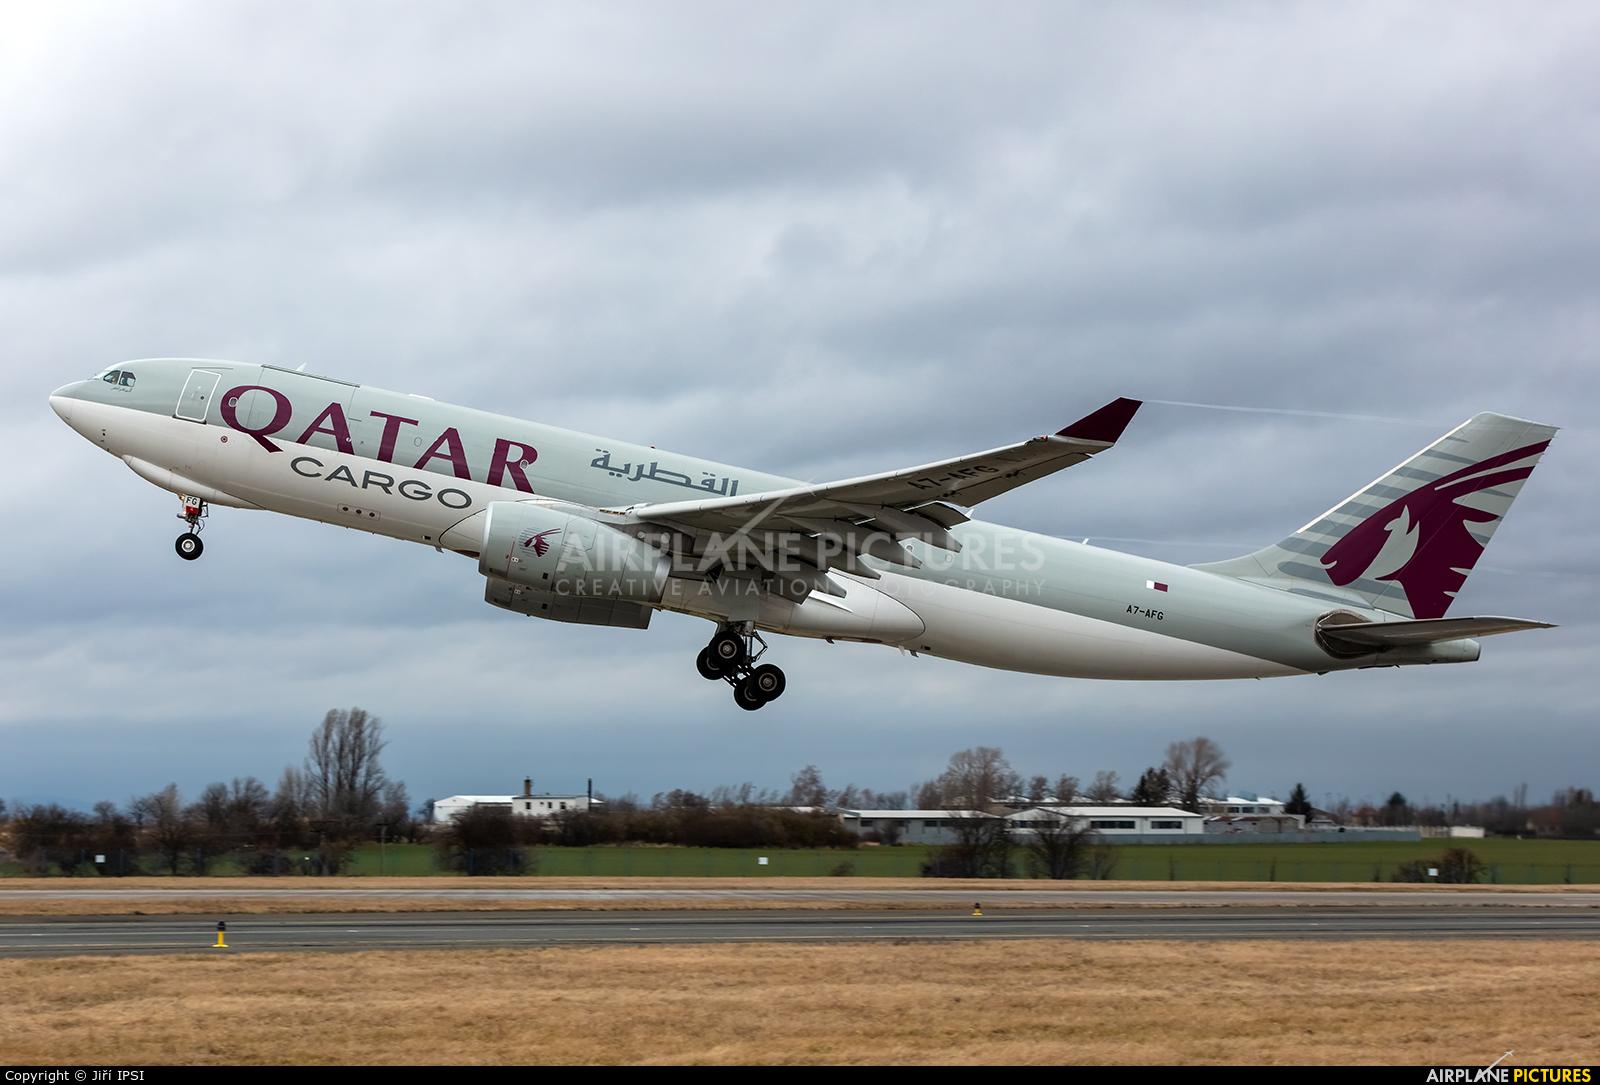 Qatar Airways Cargo A7-AFG aircraft at Prague - Václav Havel